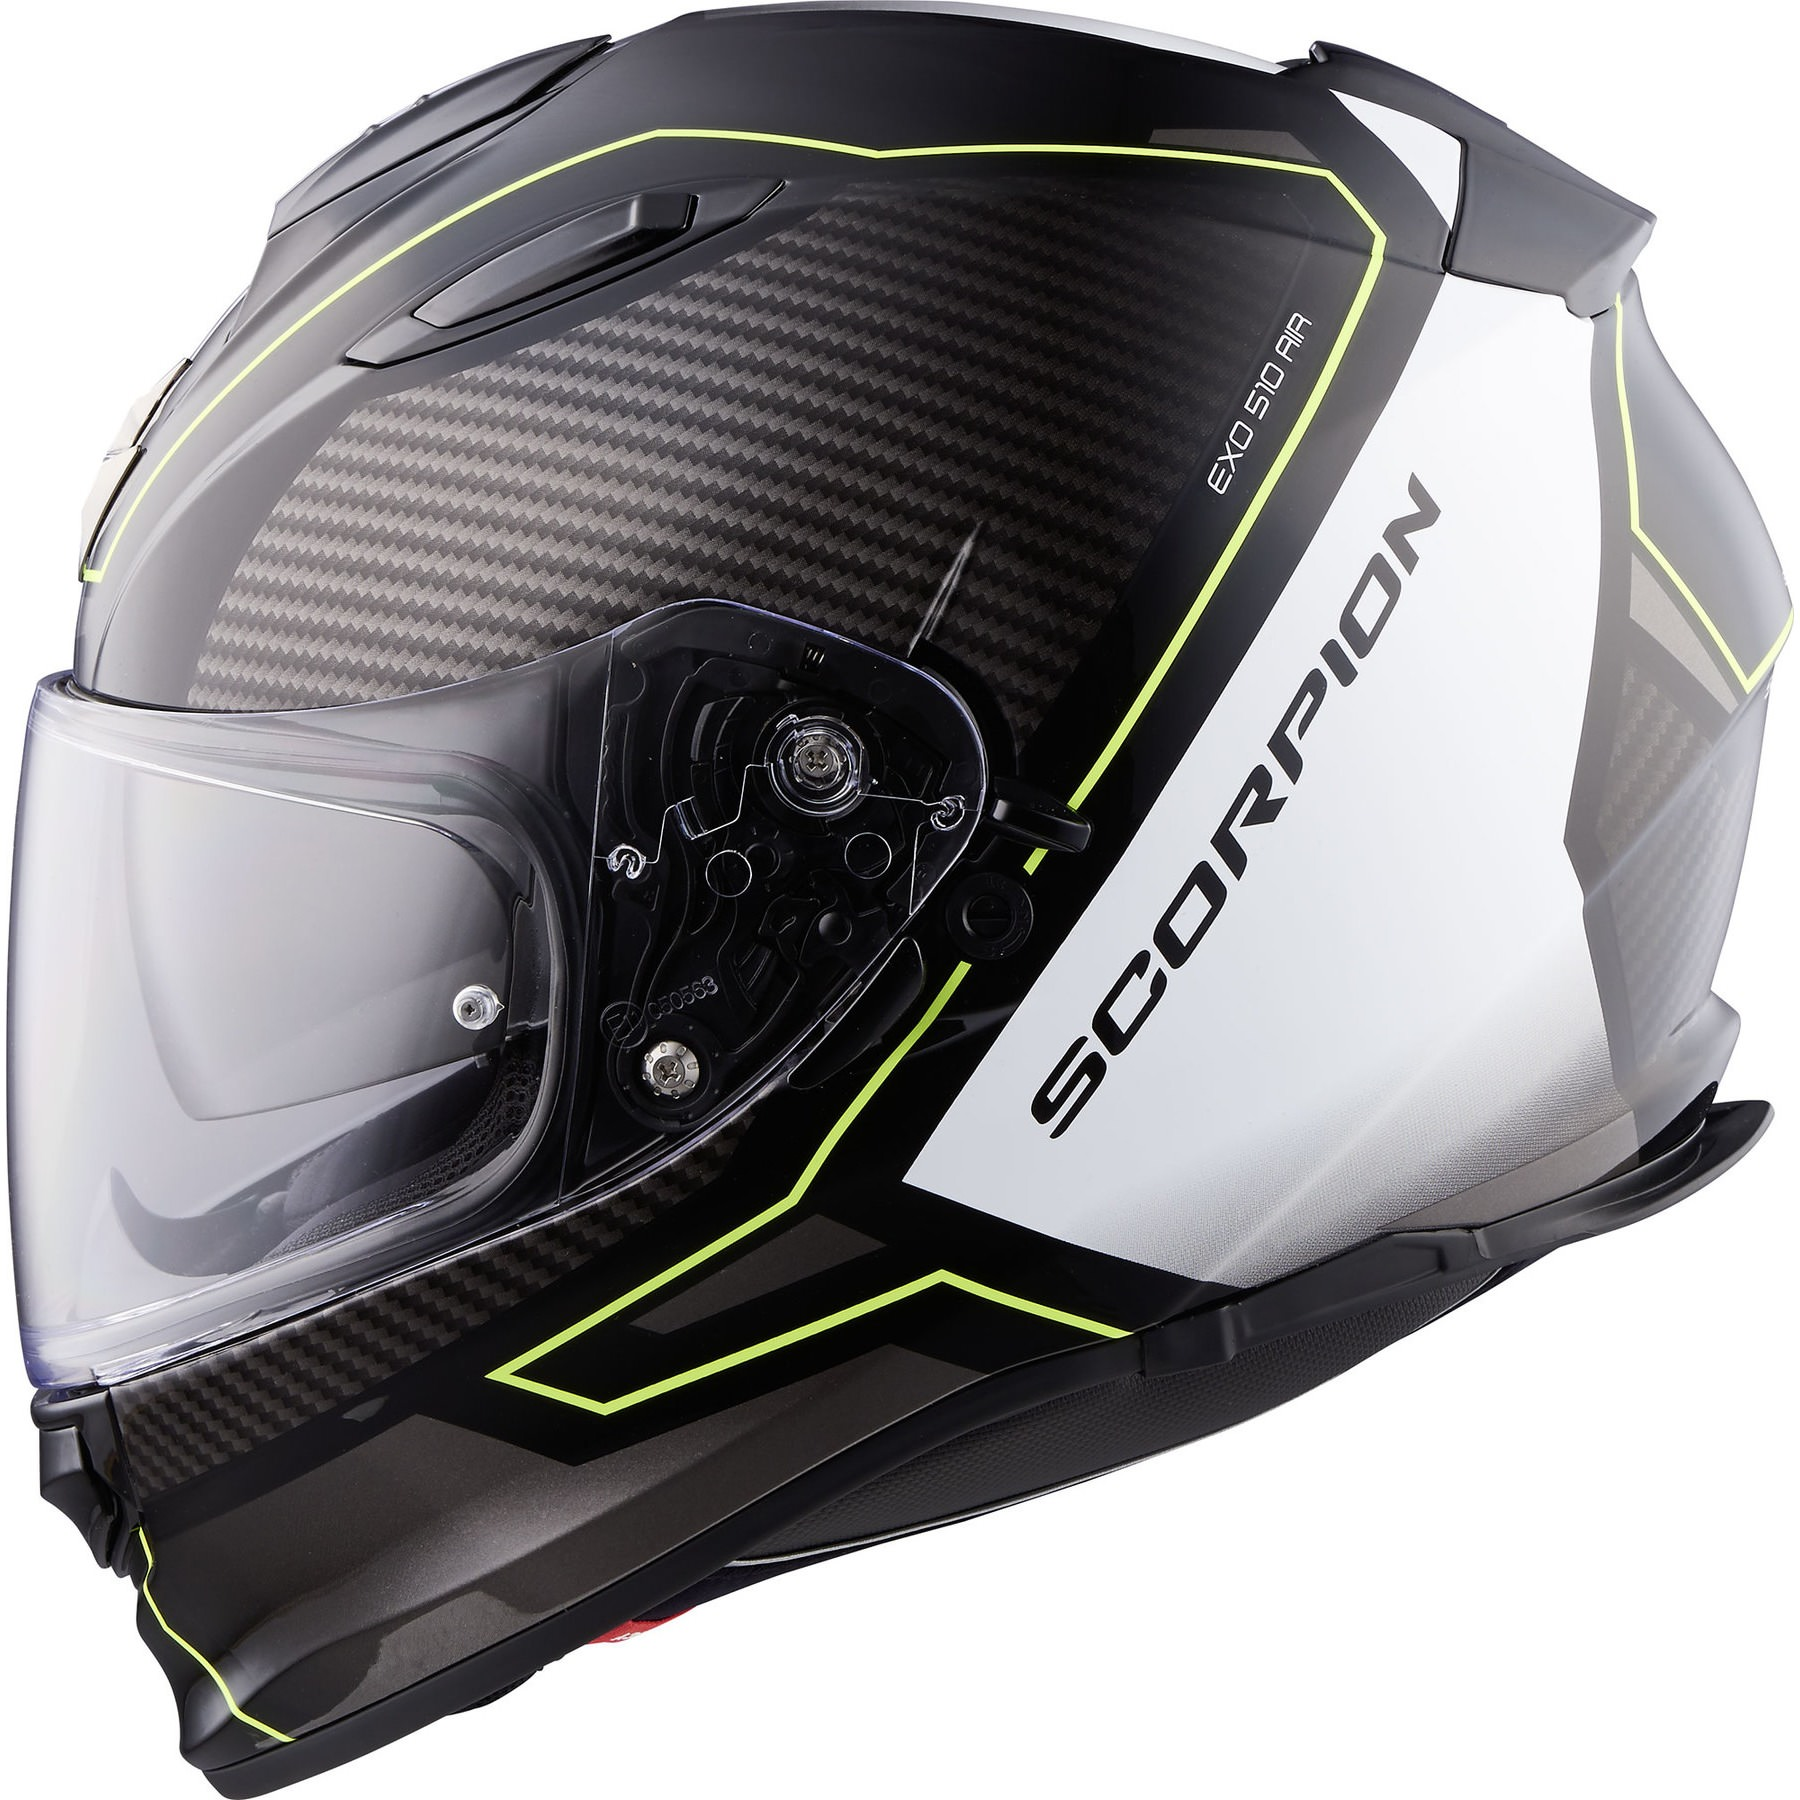 White Scorpion EXO-510 AIR Motorcycle Helmet Size XL